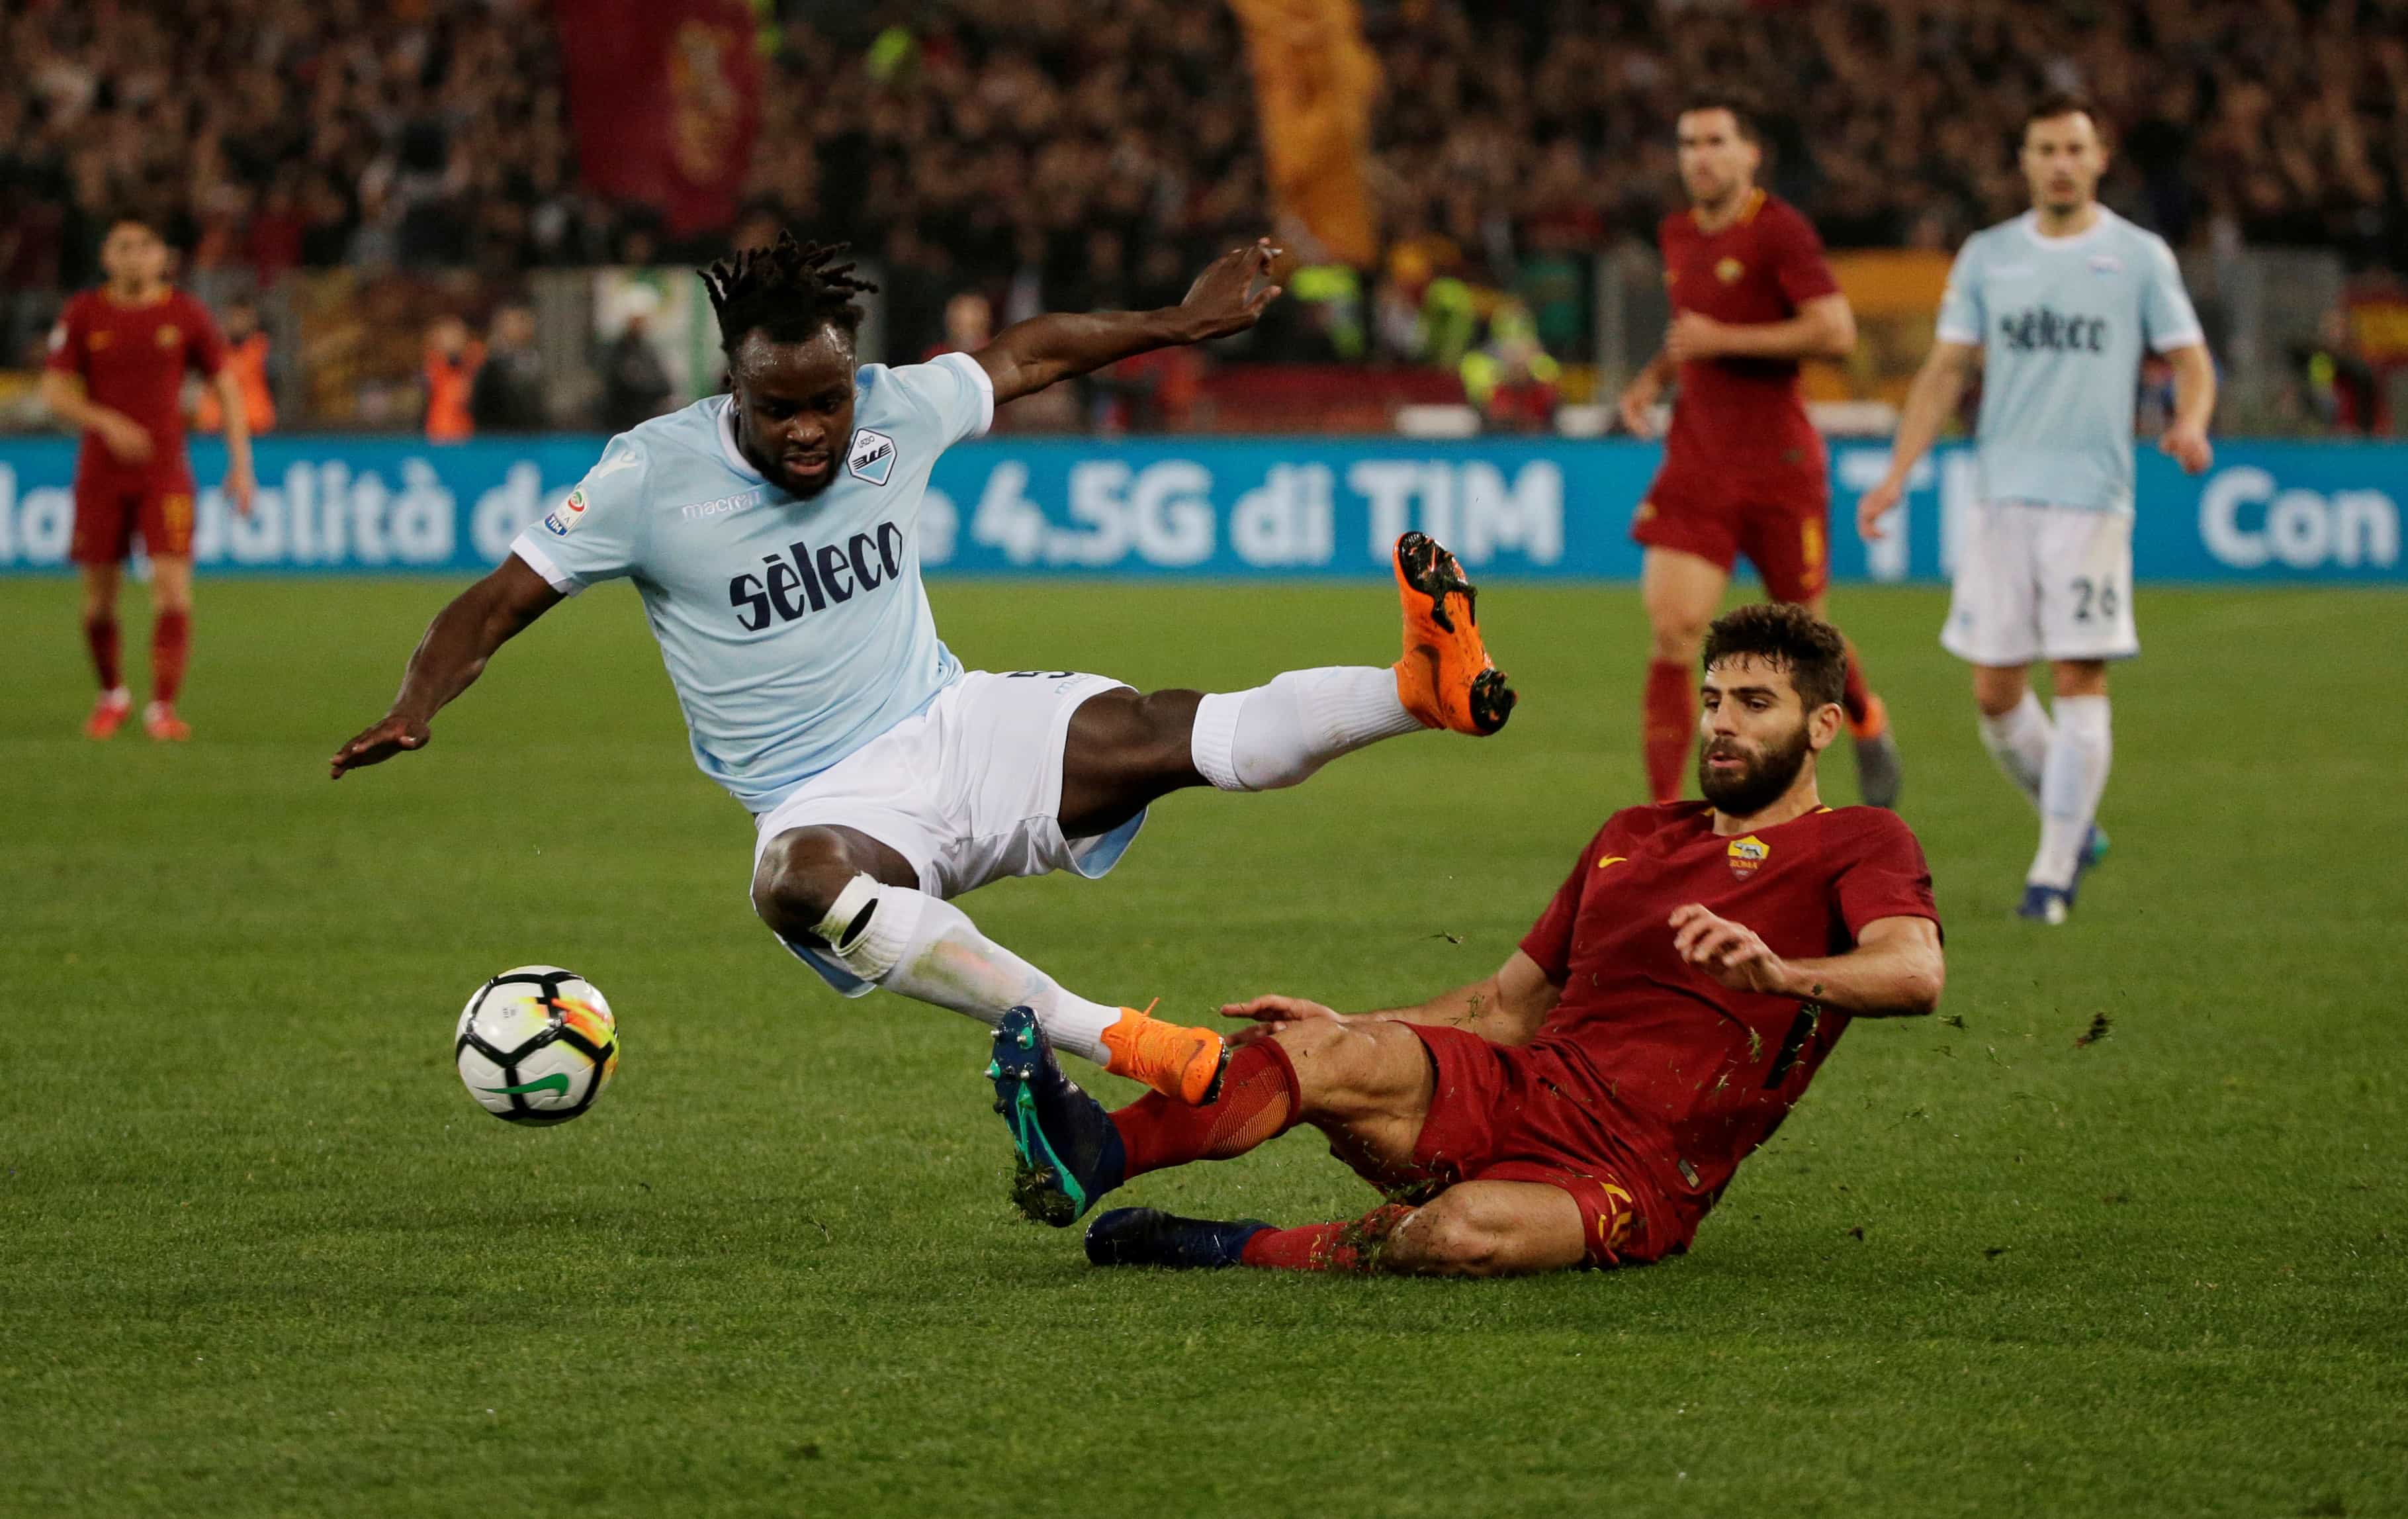 Lazio e Roma empatam e mantêm-se irmanadas na rota da Champions